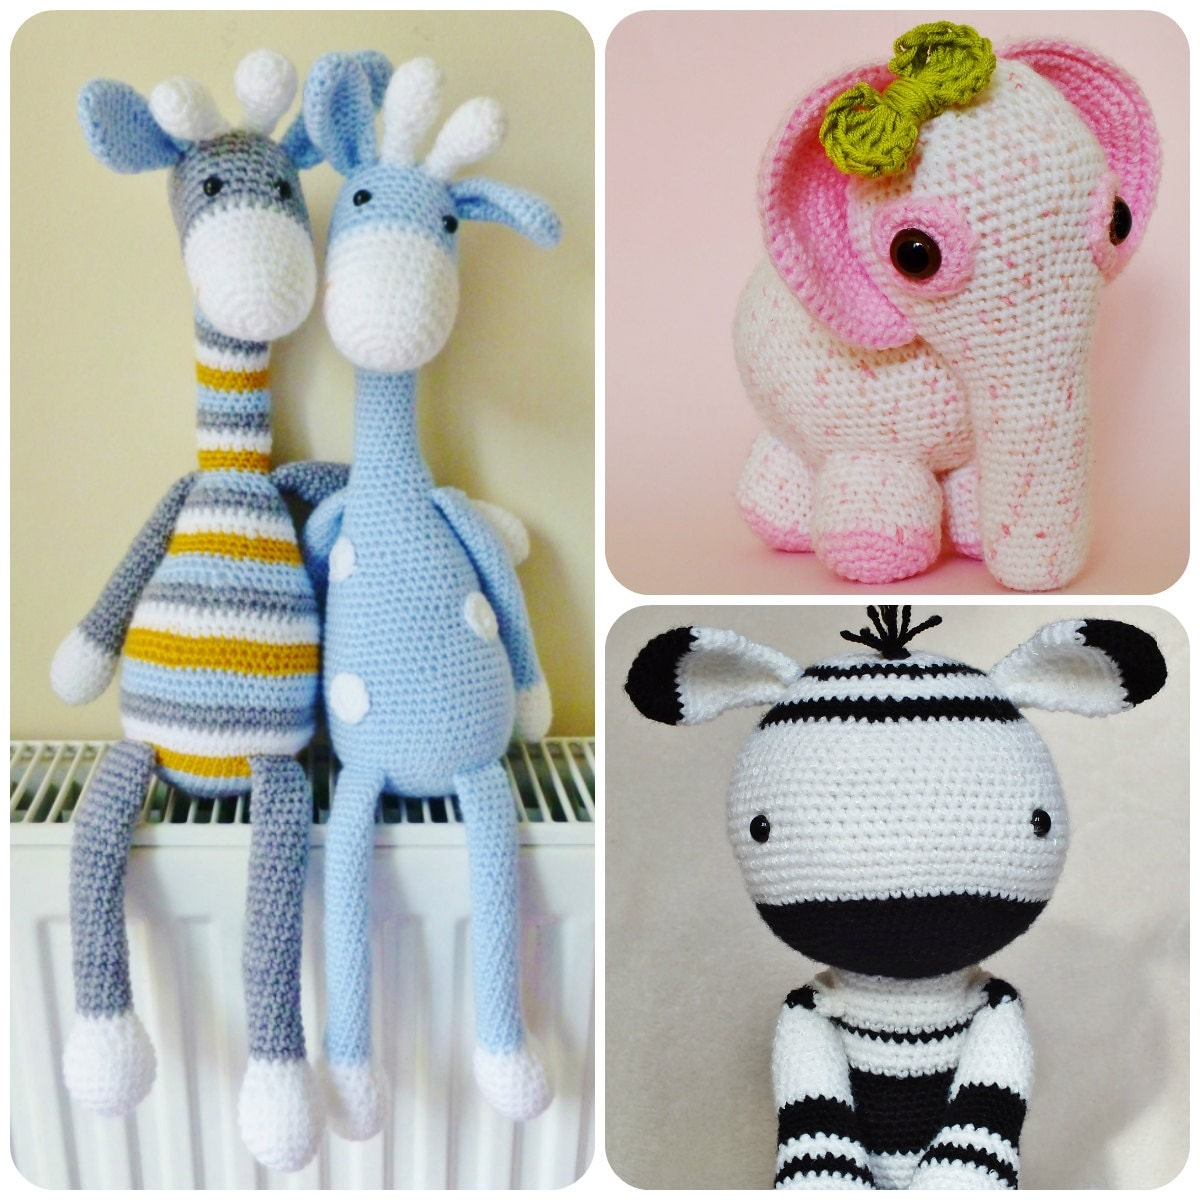 Amigurumi Yarn Pack : Crochet Amigurumi PATTERN Pack Special Offer Giraffe Elephant